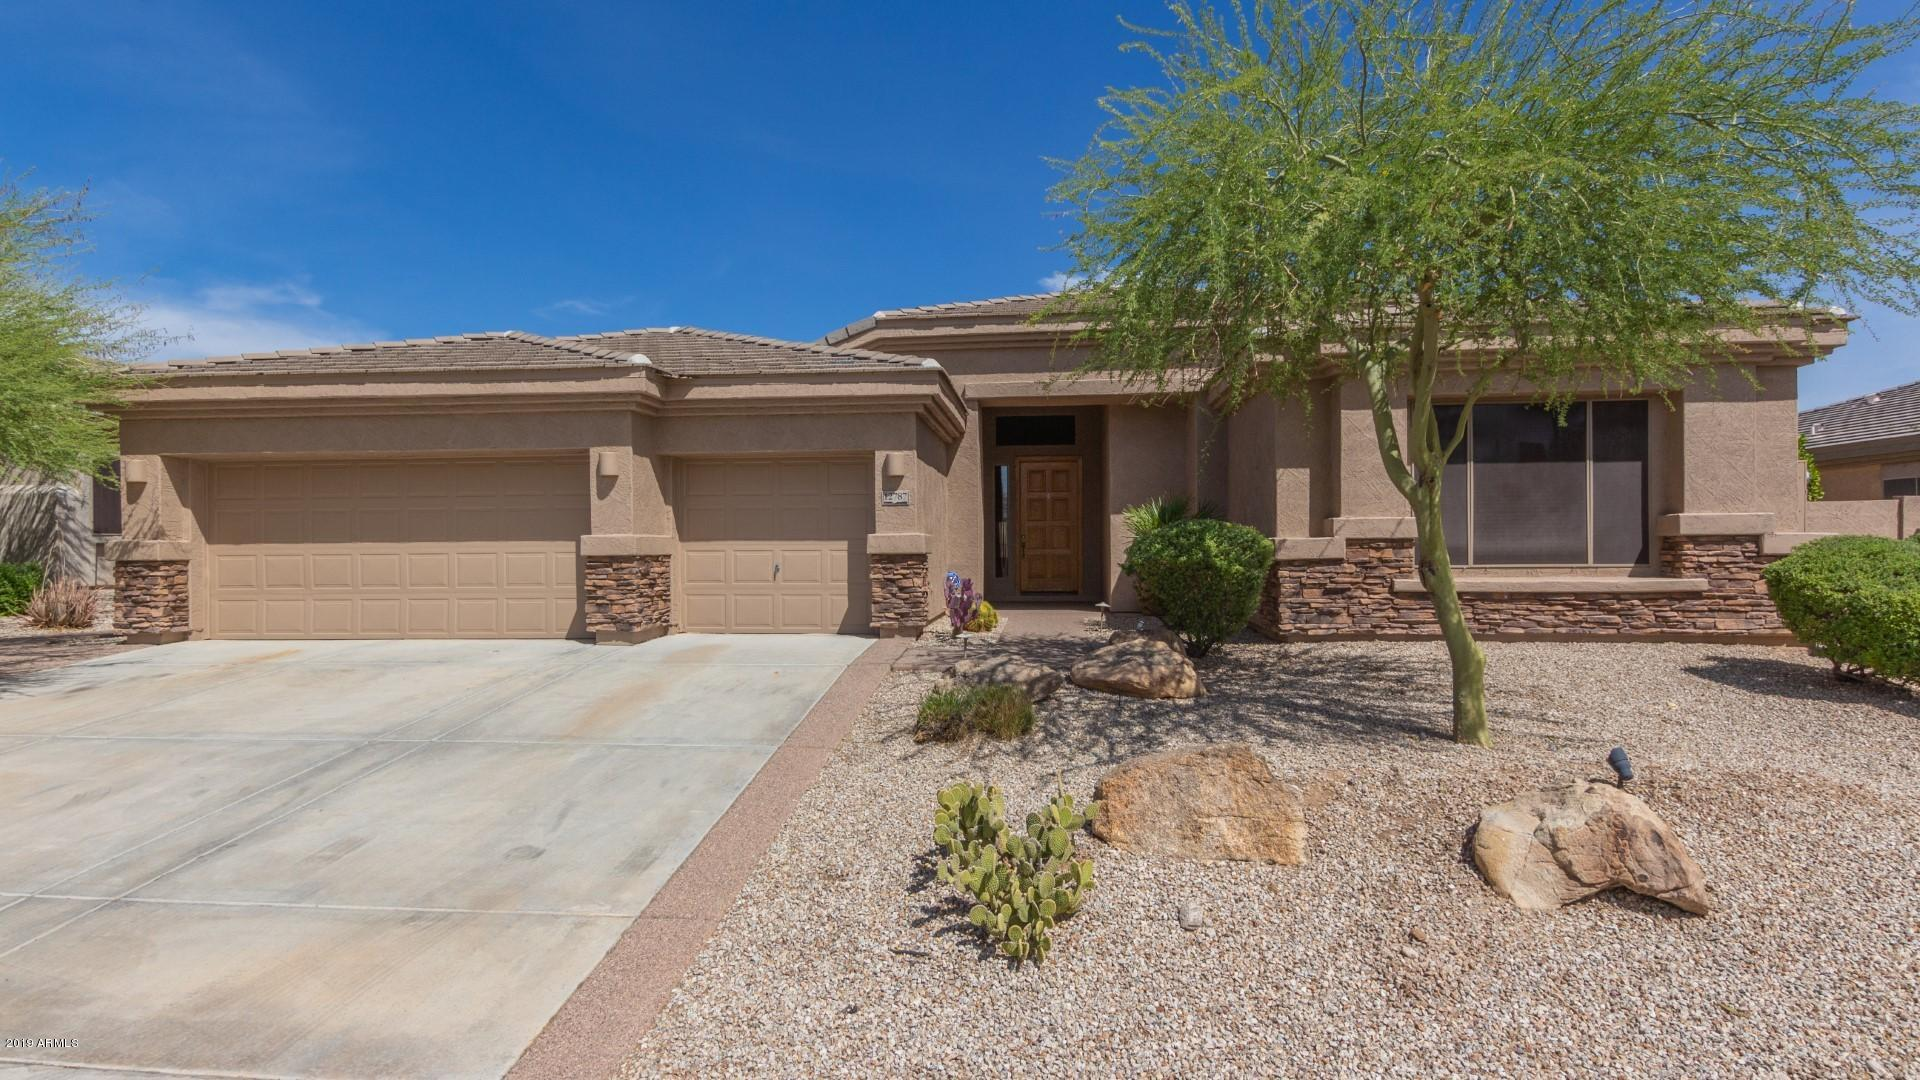 Photo of 12787 S 177TH Avenue, Goodyear, AZ 85338